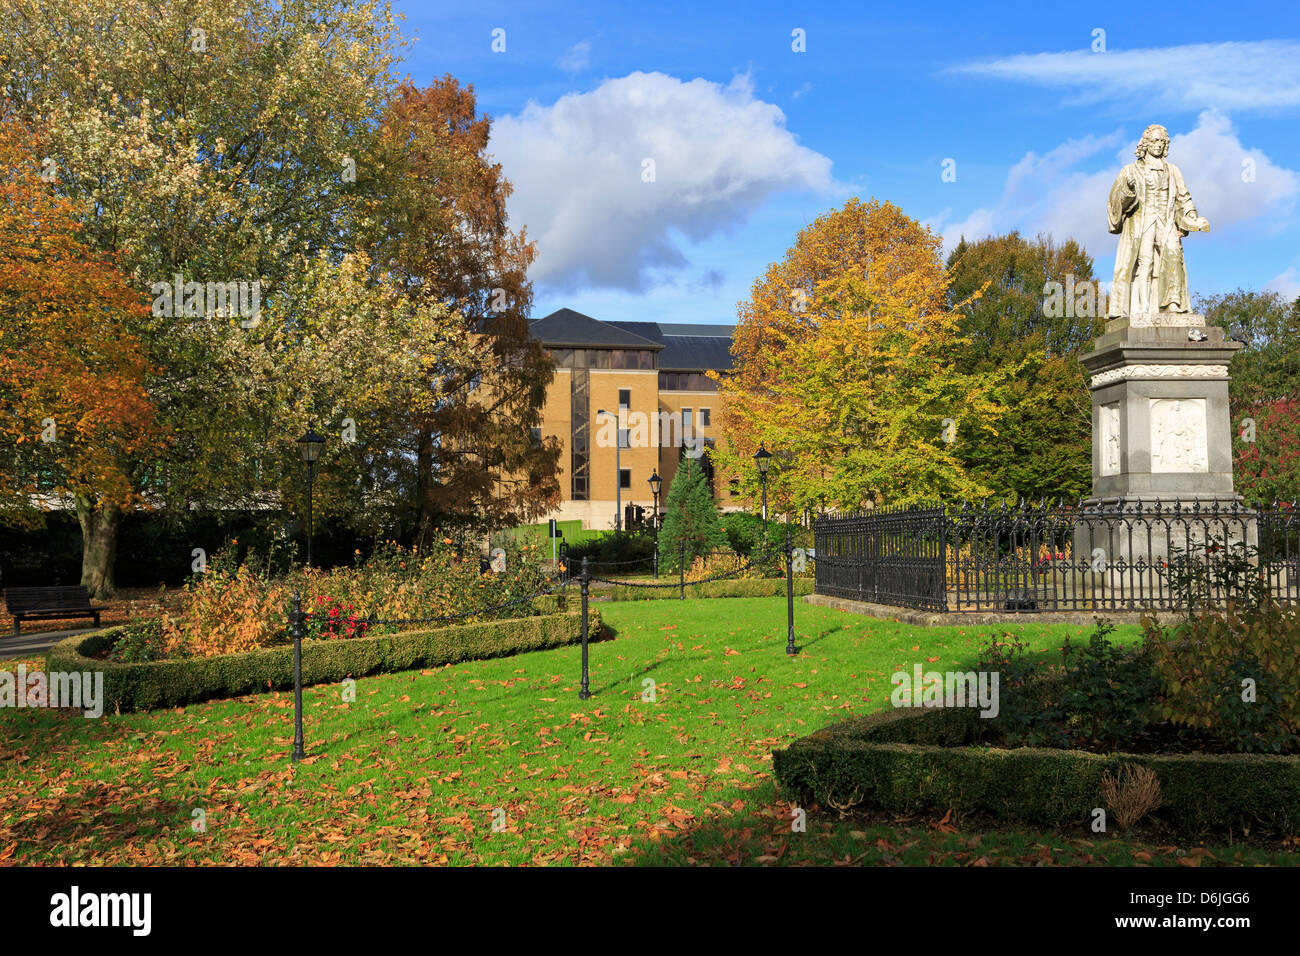 Isaac Watts statue in West Park, Southampton, Hampshire, England, United Kingdom, Europe - Stock Image